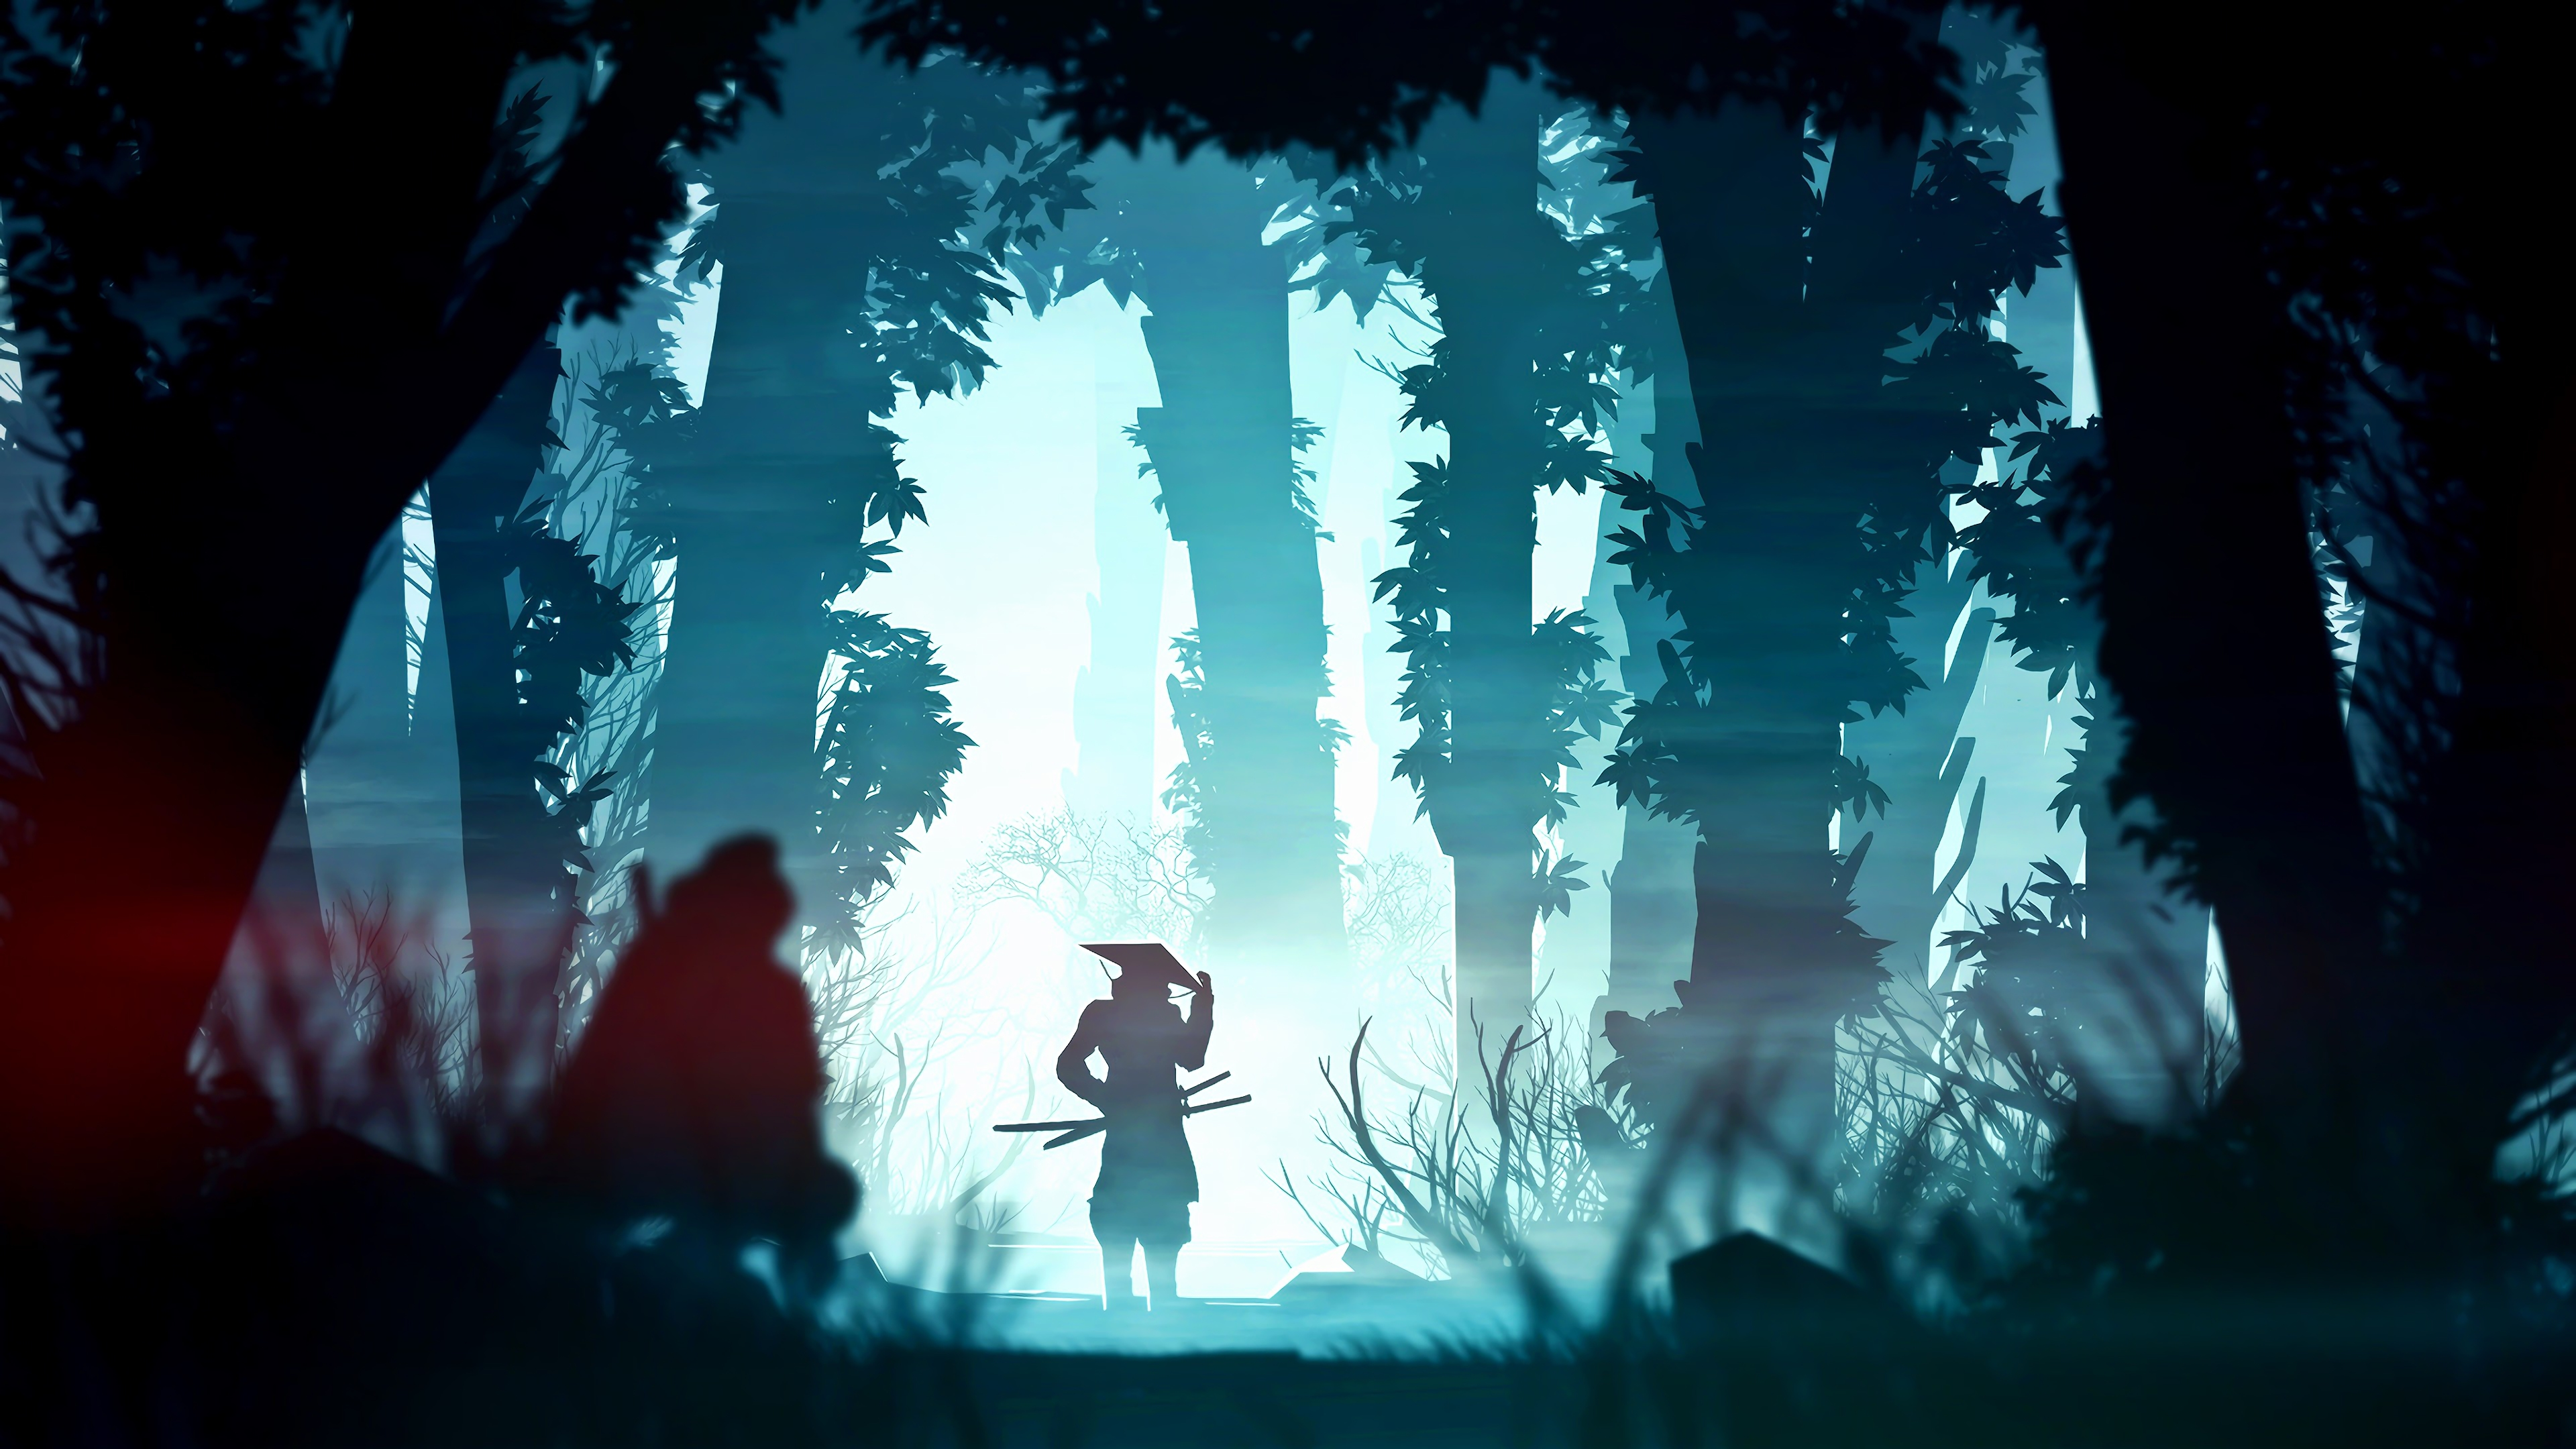 samurai digital art 4k 1551642861